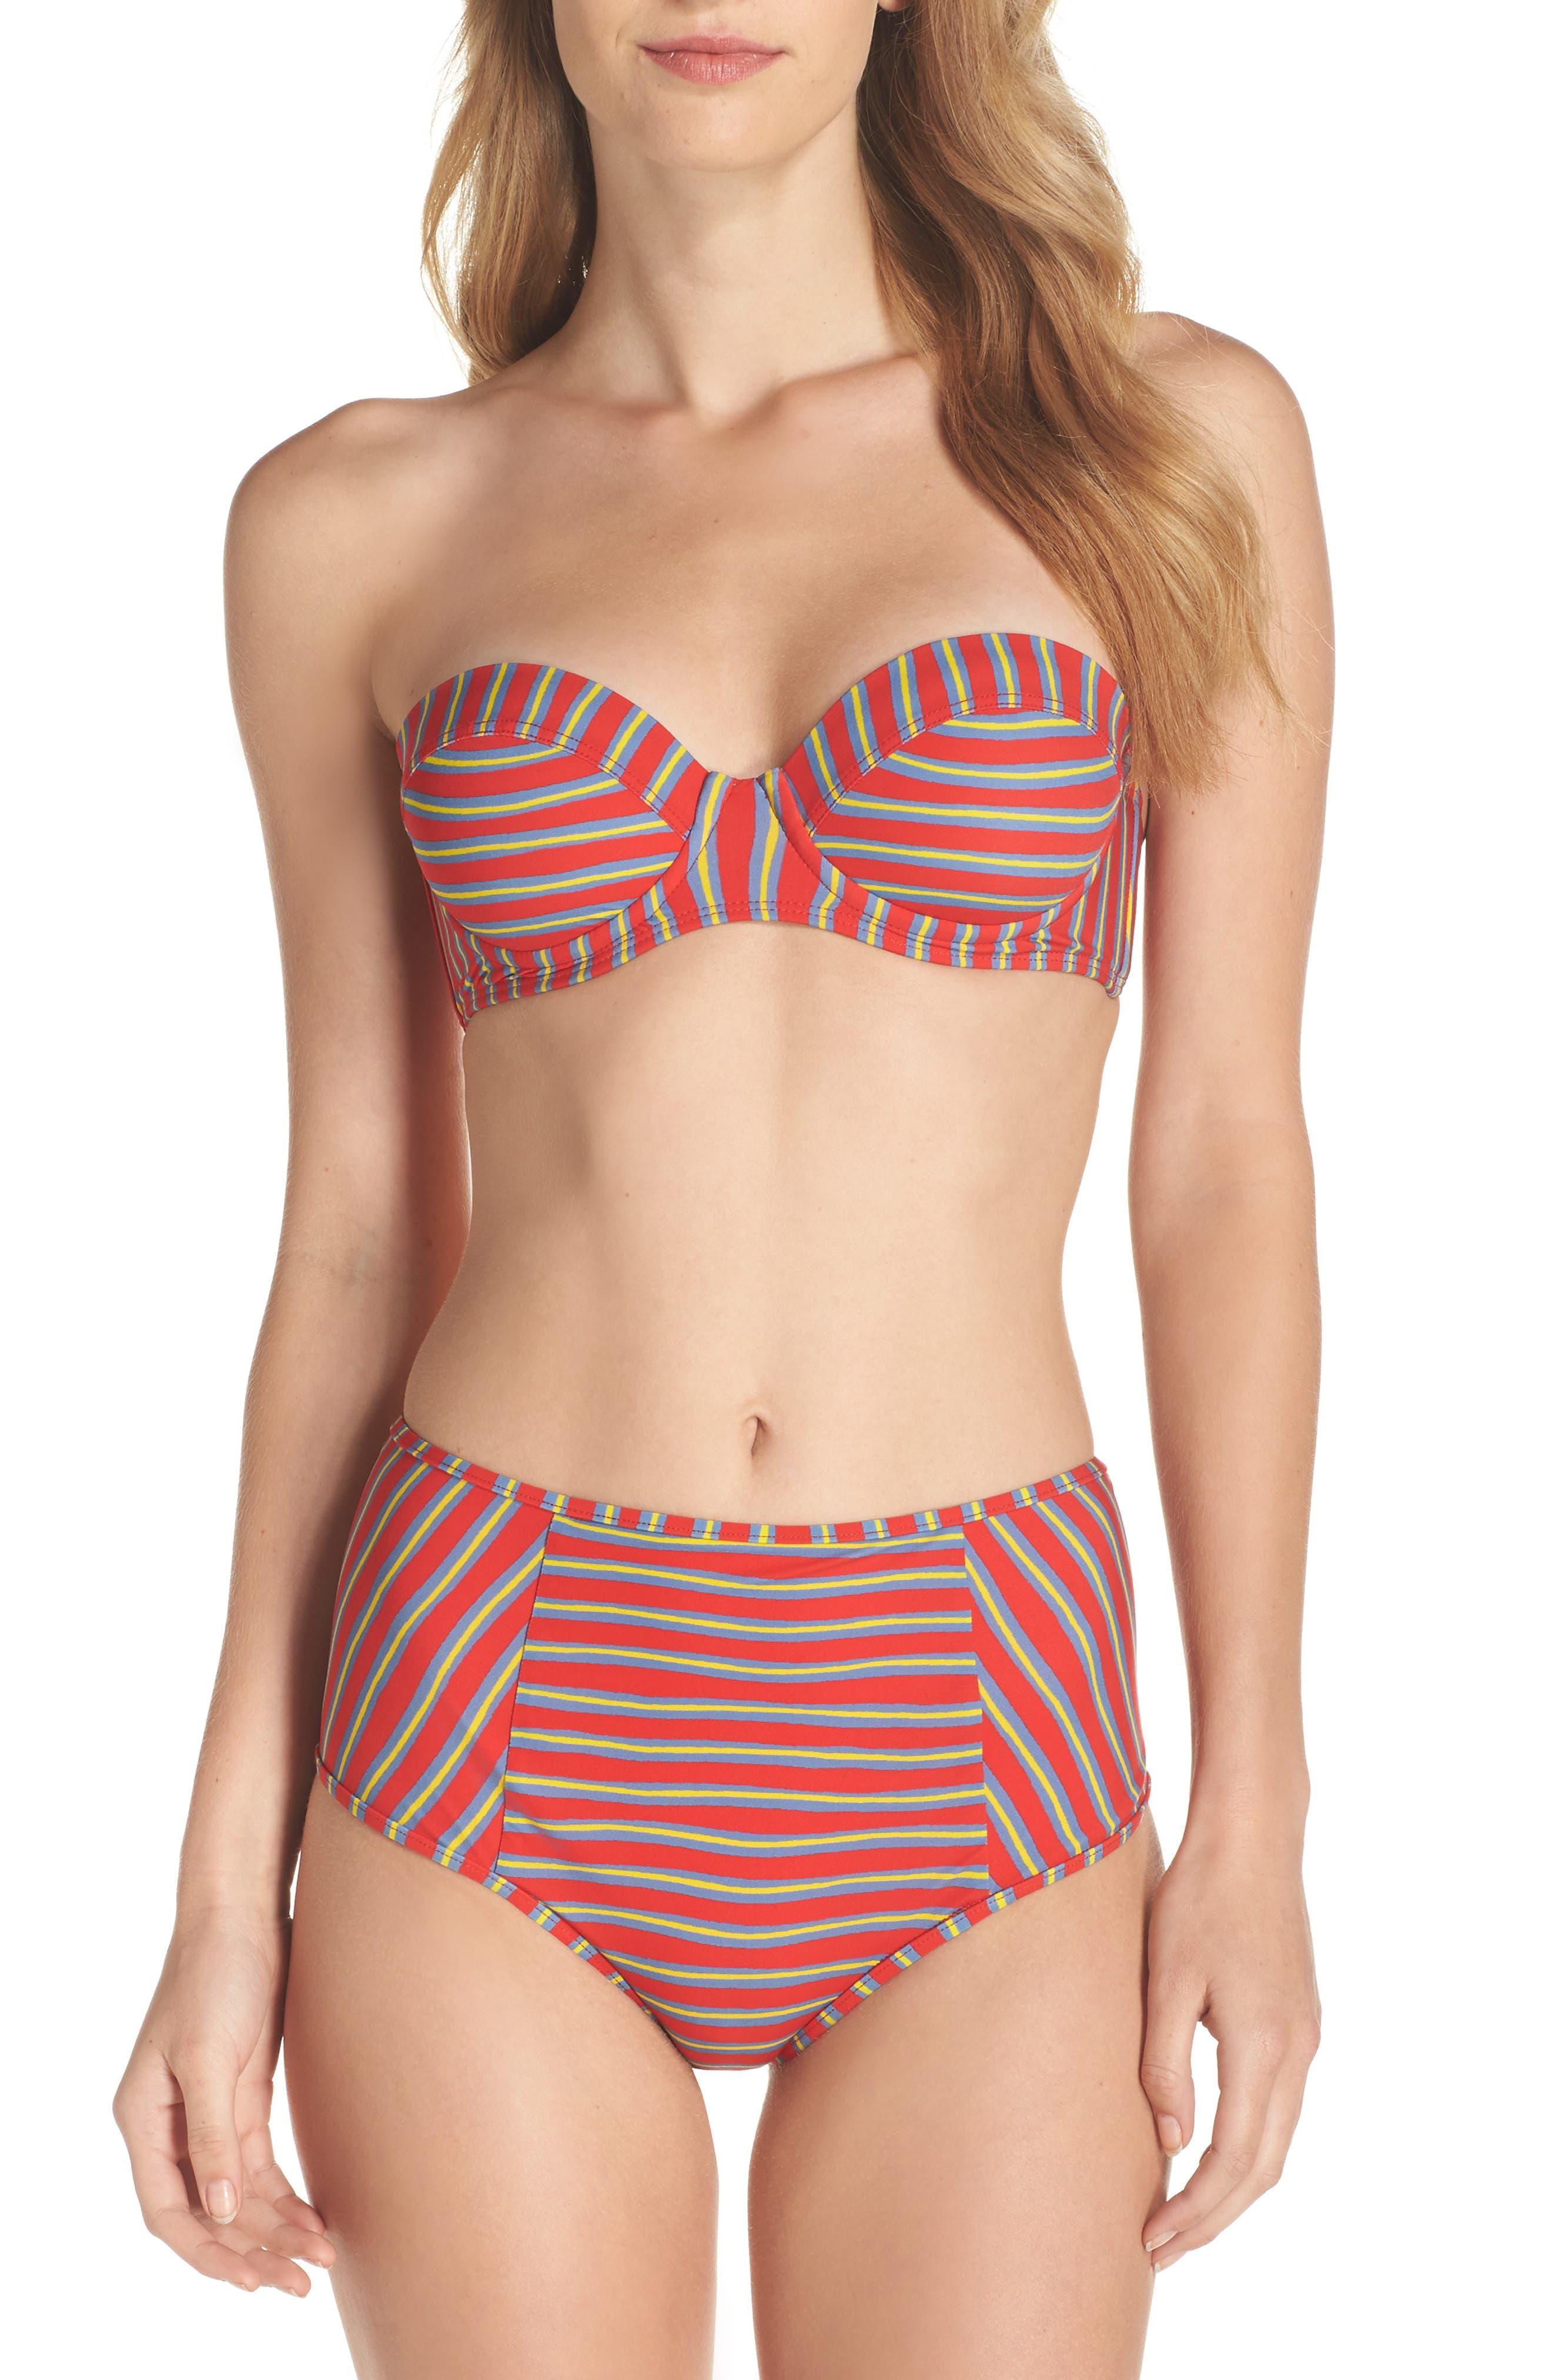 Strapless Bikini Top,                             Alternate thumbnail 7, color,                             Bodin Stripe Bright Red